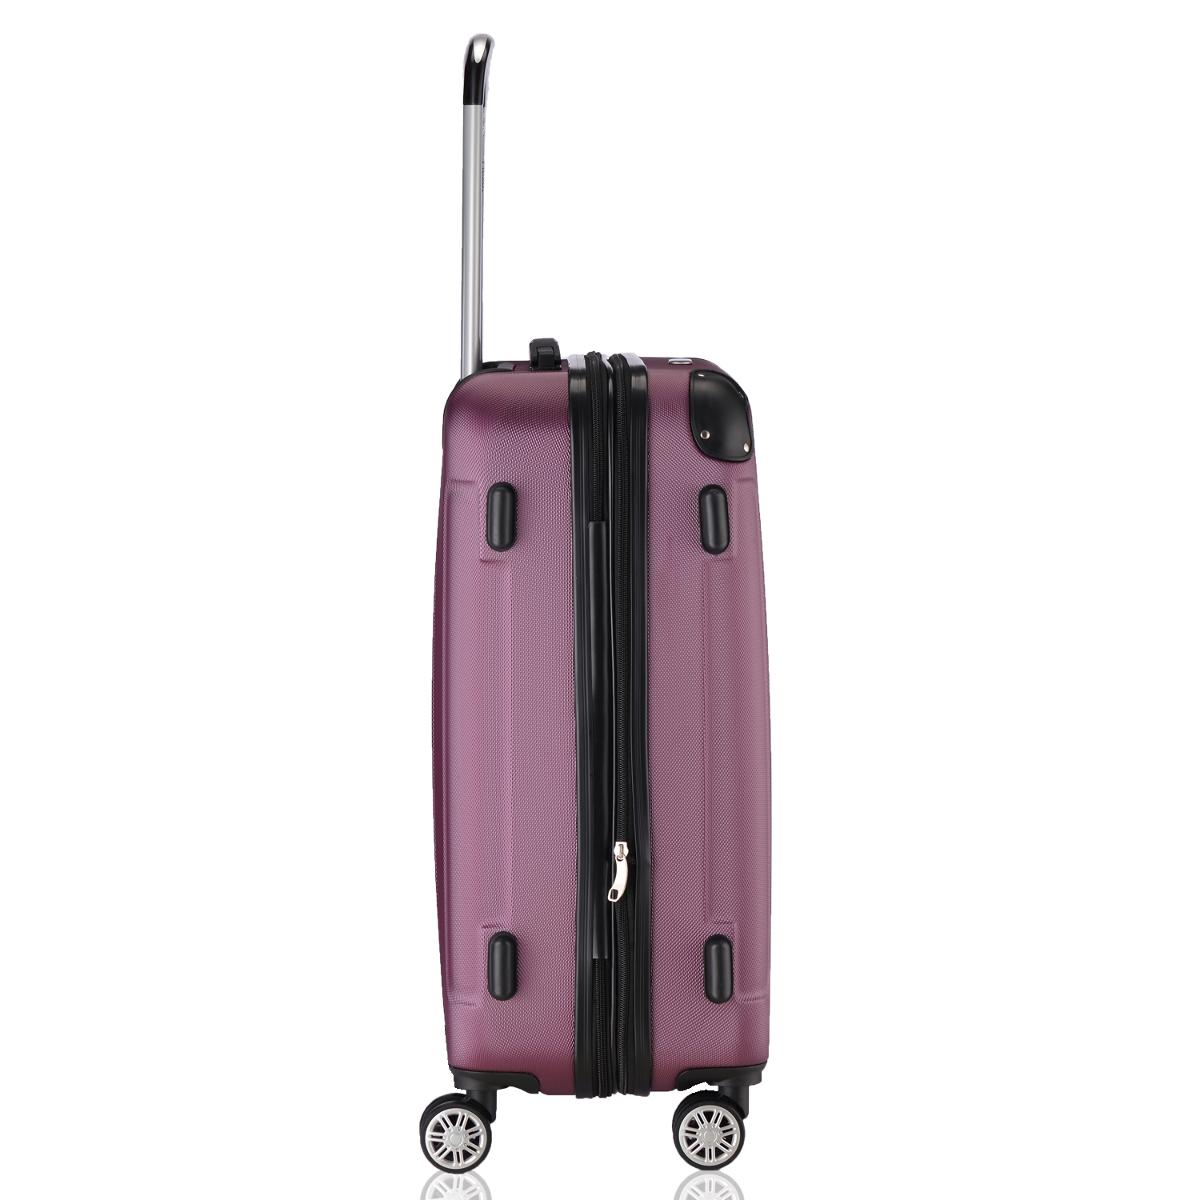 Koffer-Flexot-2045-Hartschalenkoffer-Trolley-Kofferset-Reisekoffer-M-L-XL-Set Indexbild 83